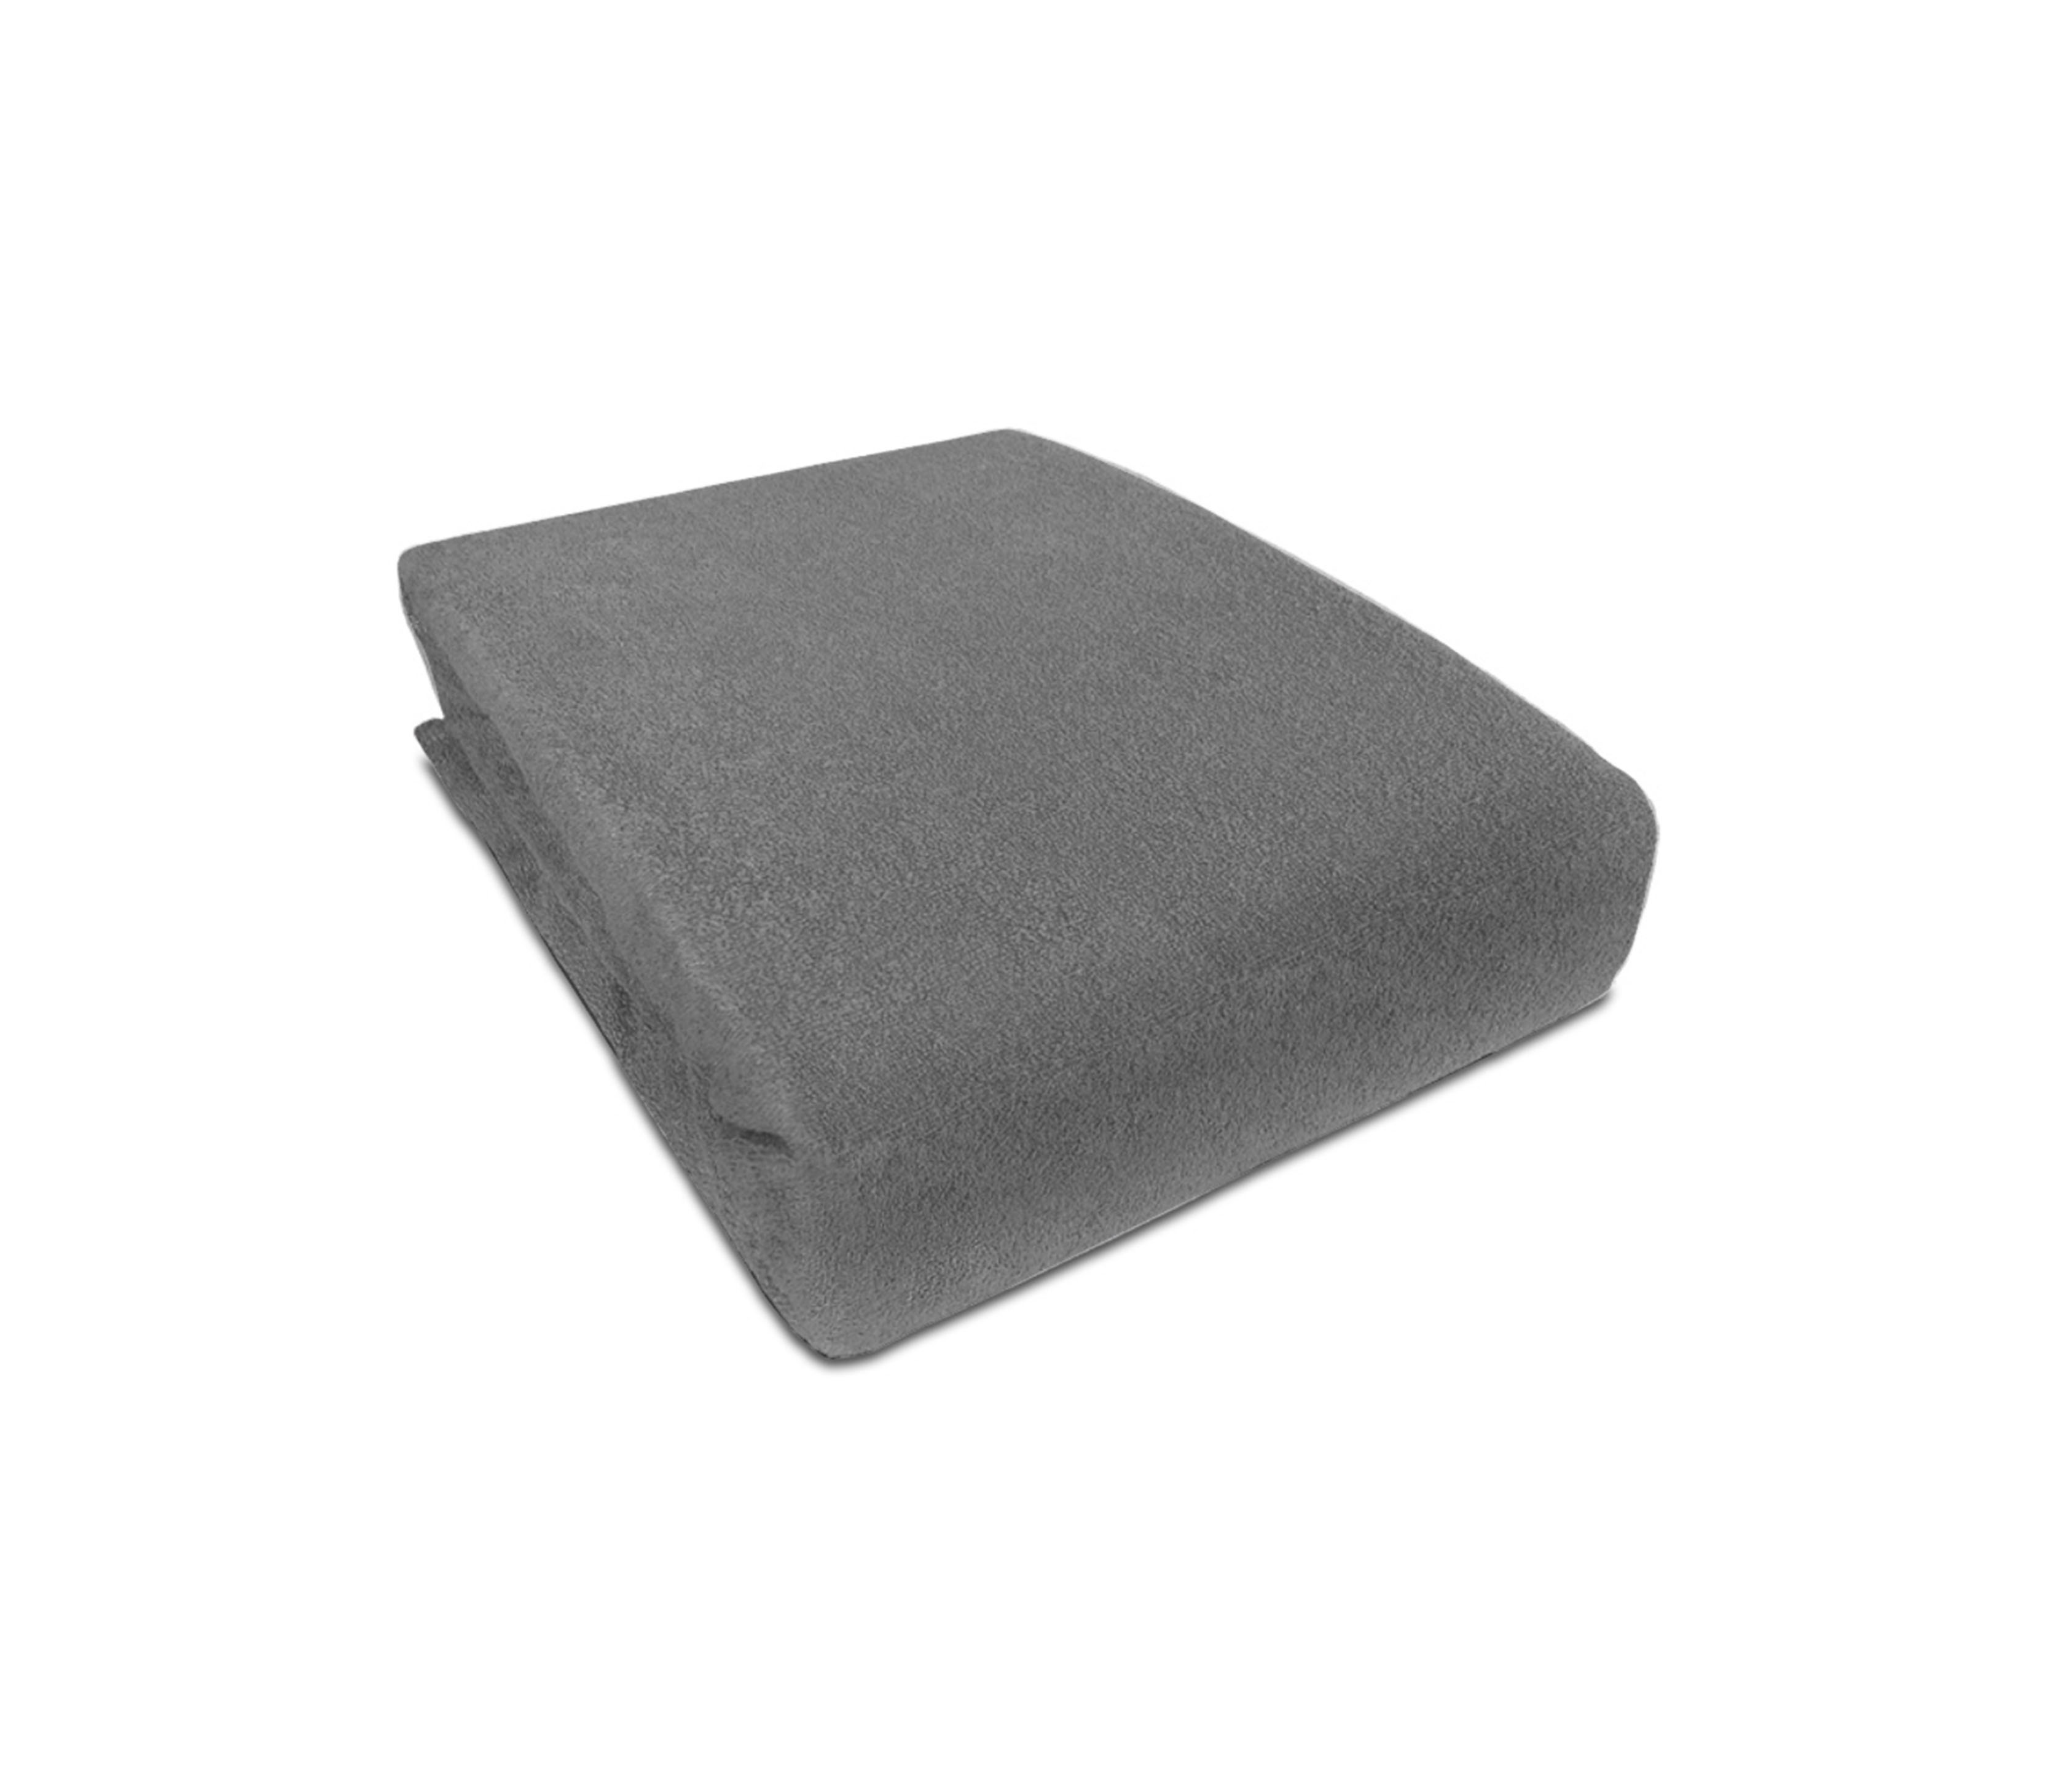 Aga Prostěradlo FROTÉ 90x200 cm Barva prostěradla: Tmavě šedá